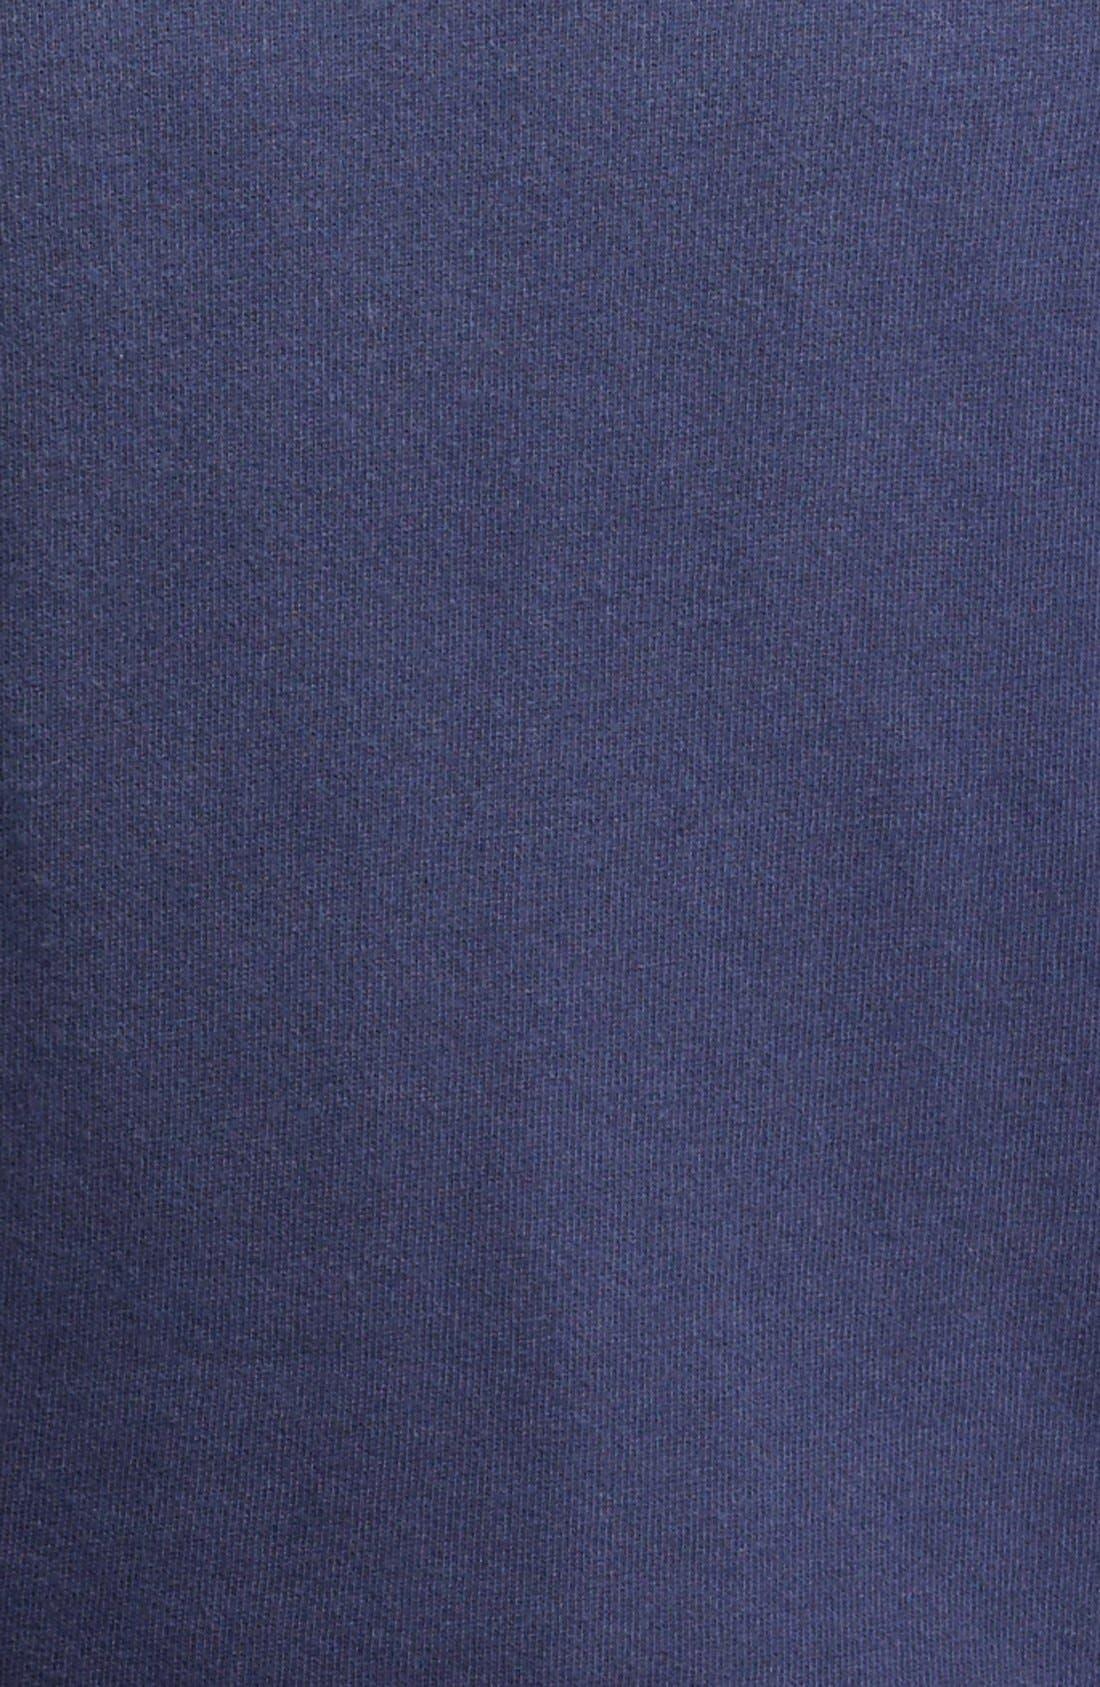 Alternate Image 3  - Polo Ralph Lauren Sweat Shirt